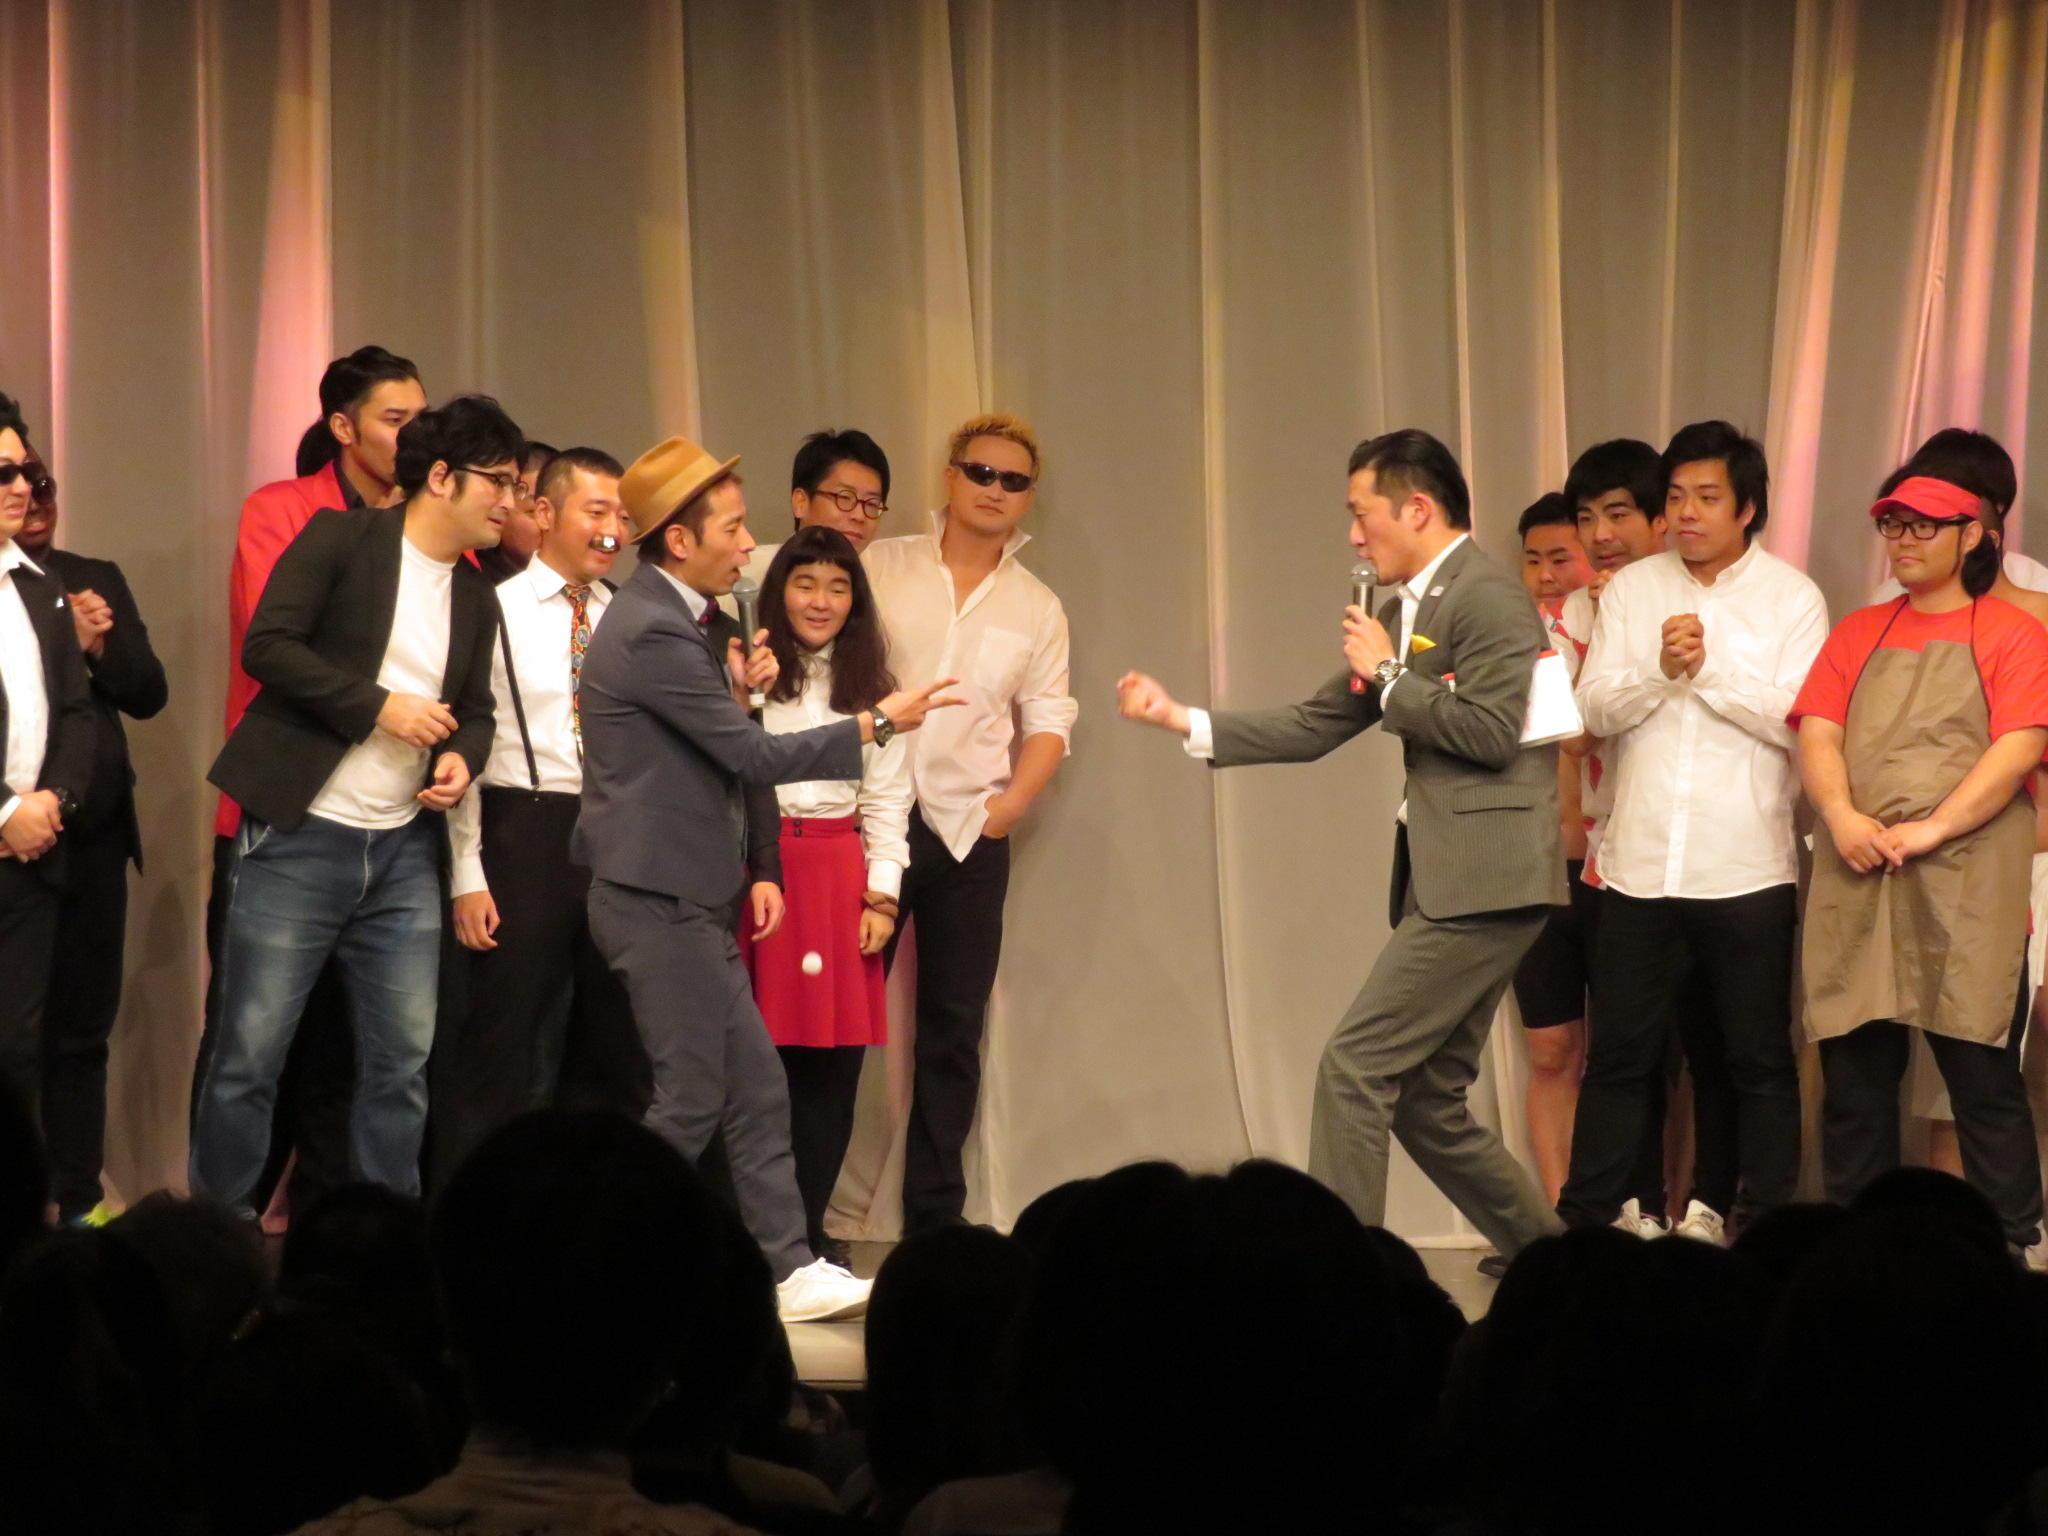 http://news.yoshimoto.co.jp/20180110191617-b3cbe8dcf1eb4b01945b2f9cd8d94ce9107ffe6e.jpg